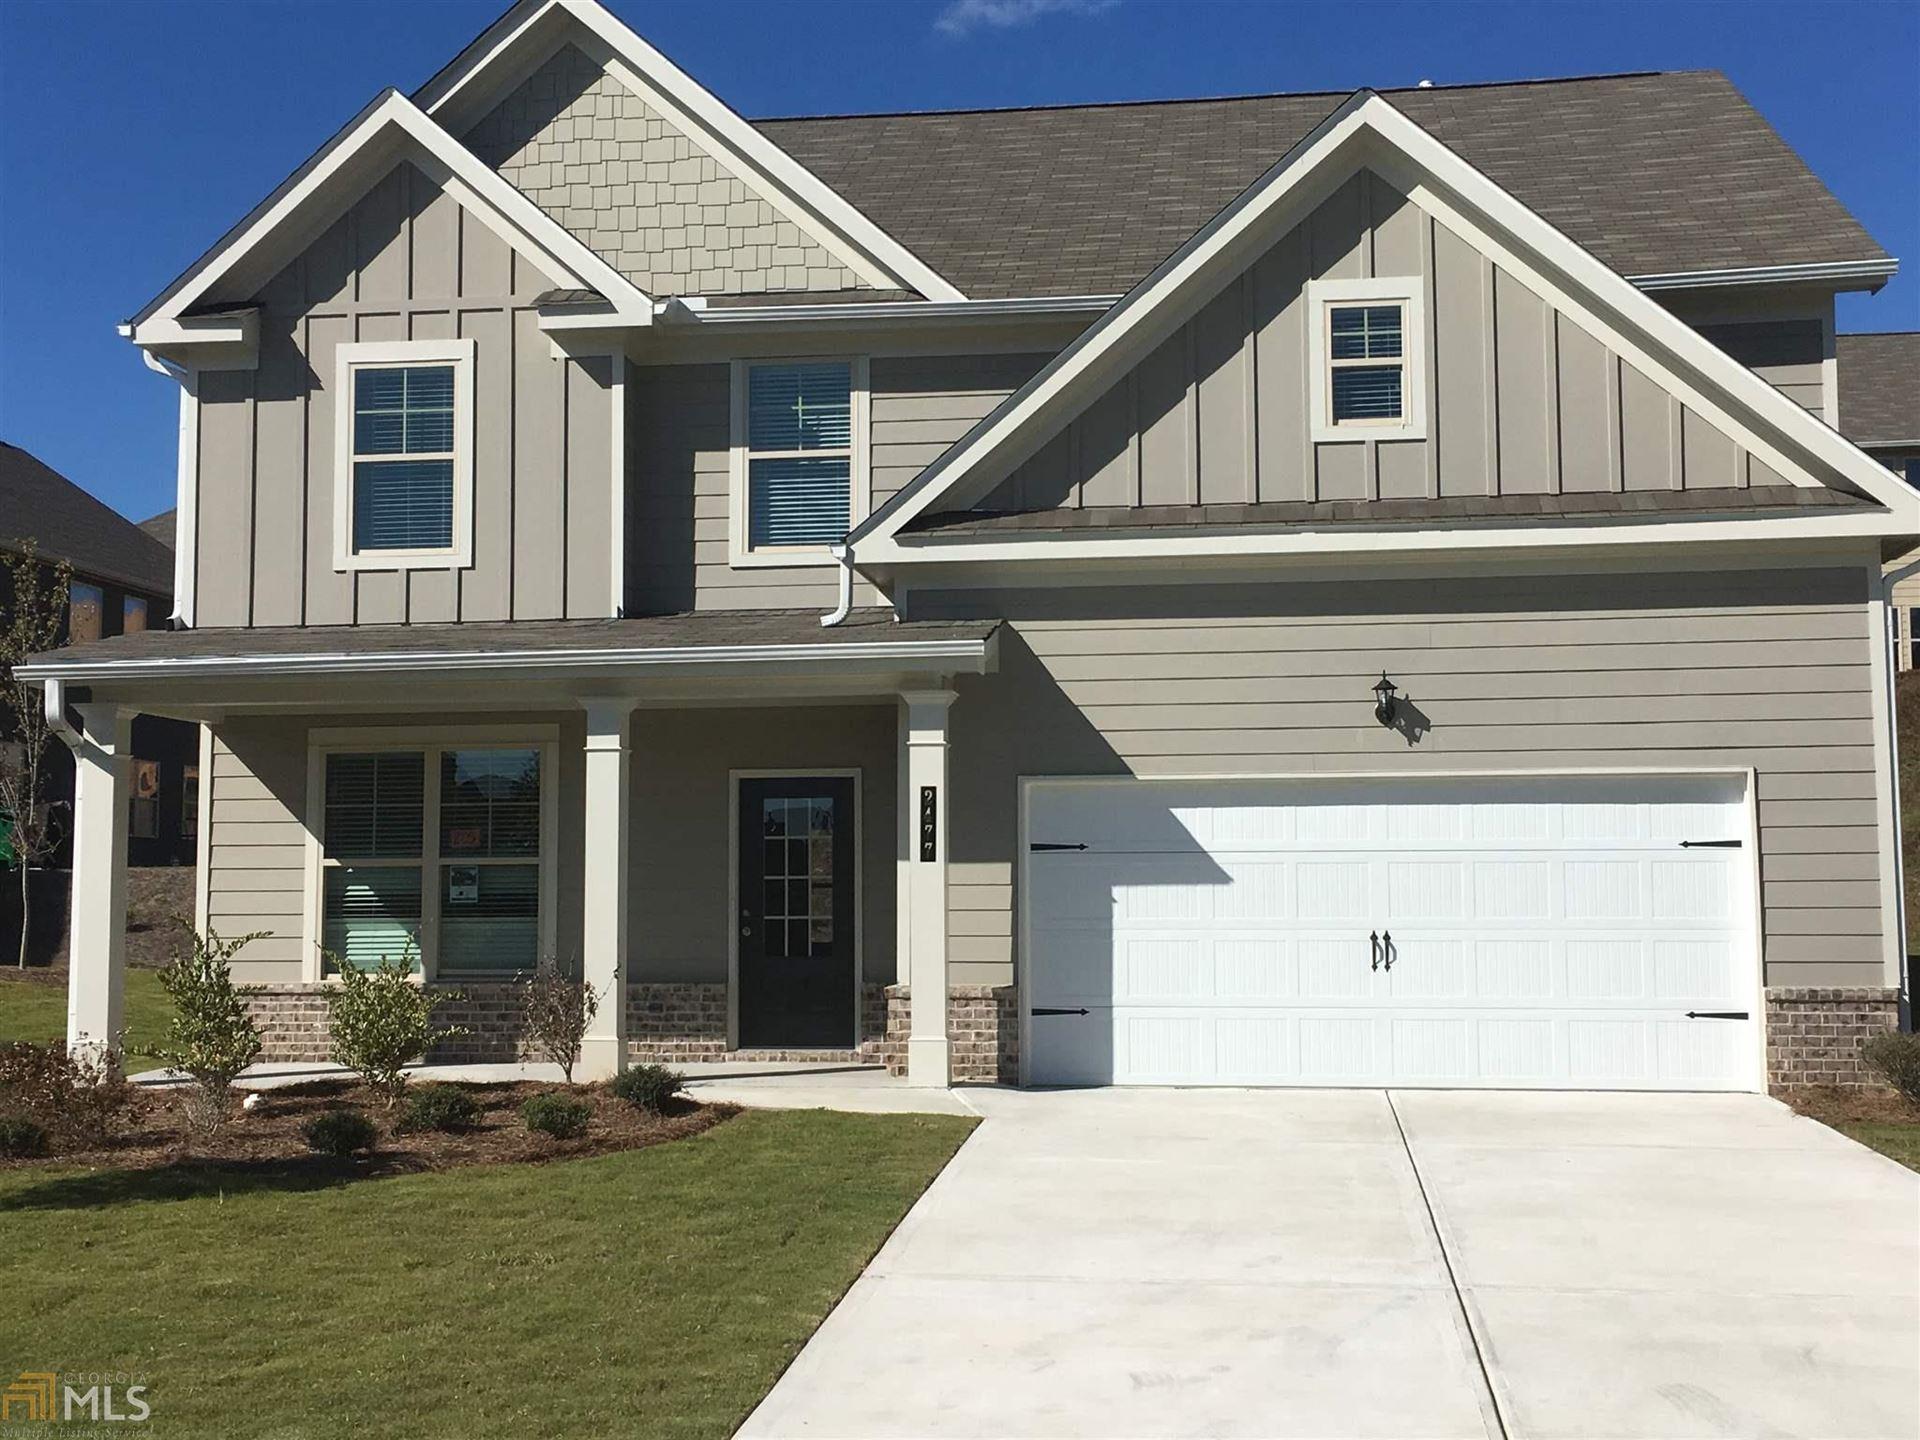 2477 Hanover Woods, Lithonia, GA 30058 - MLS#: 8868992